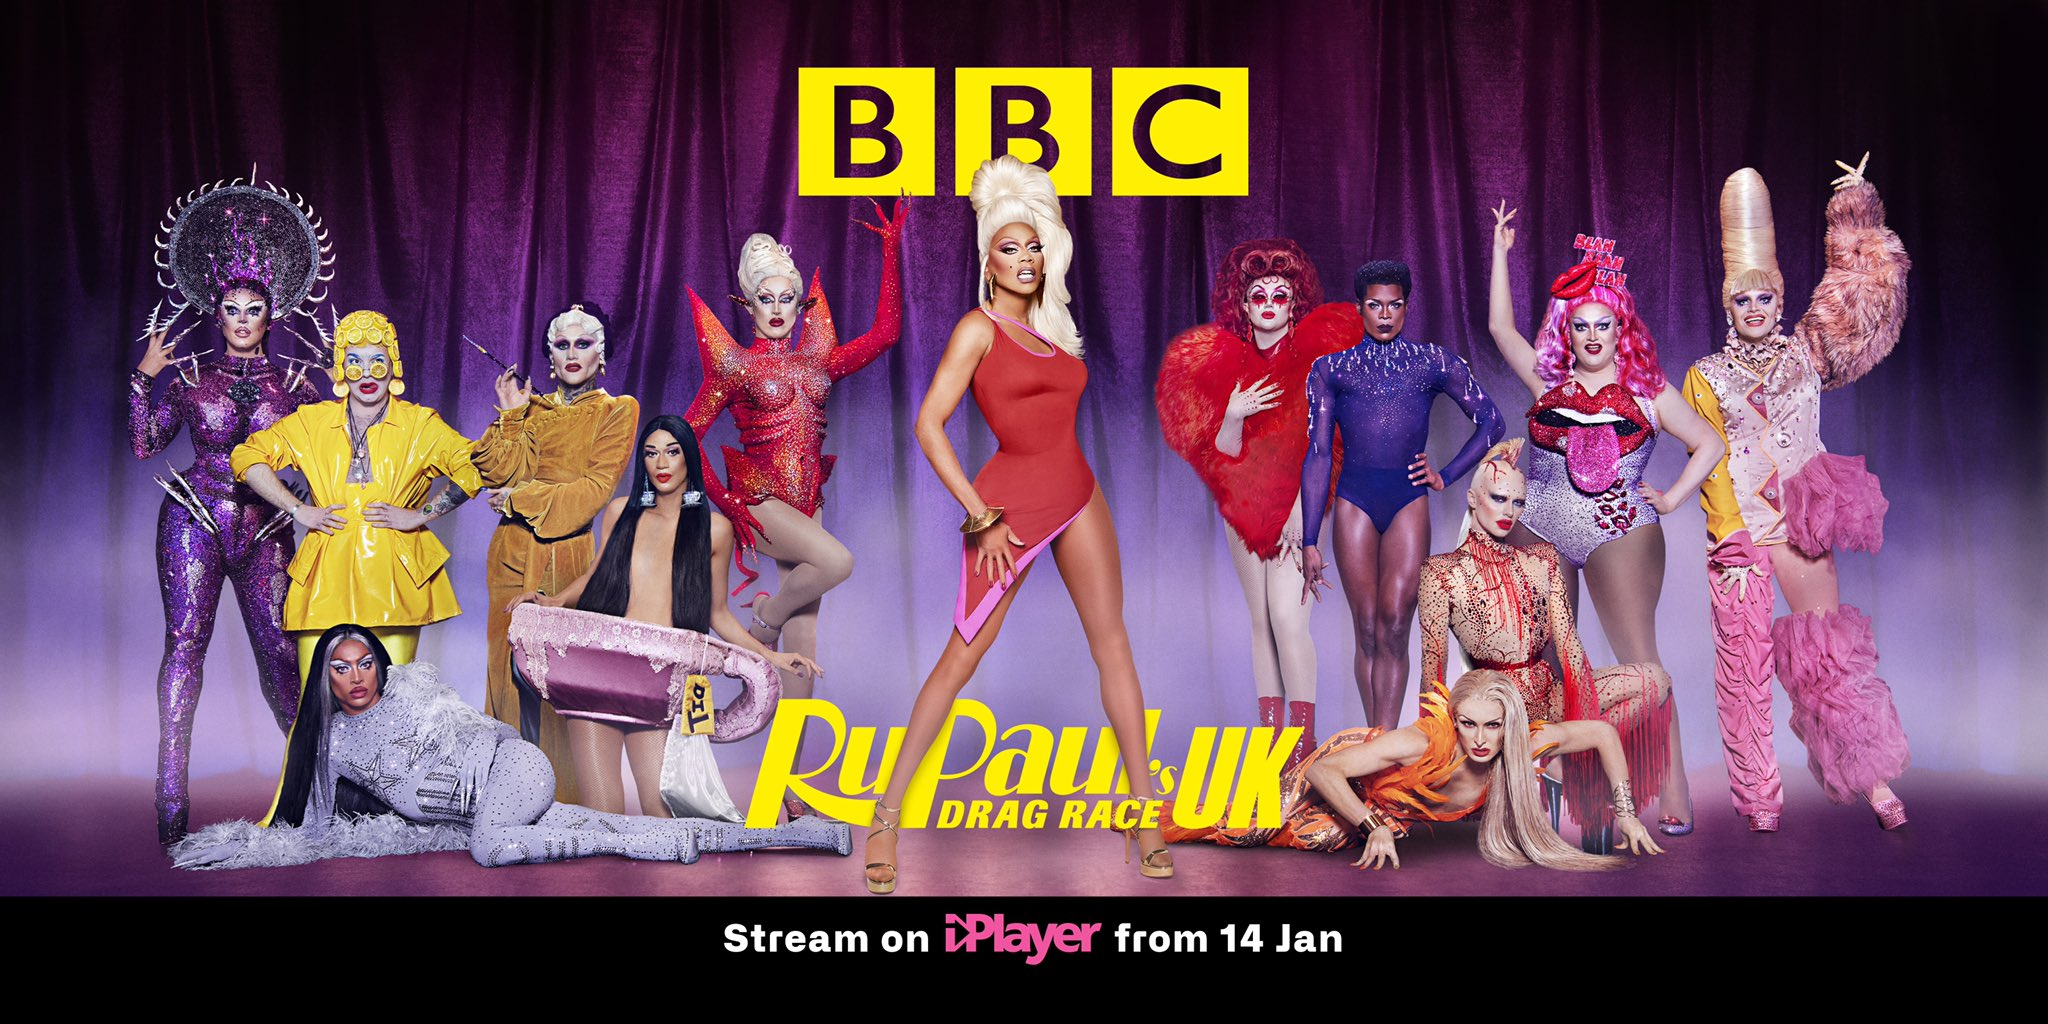 Drag Race UK season 2 poster